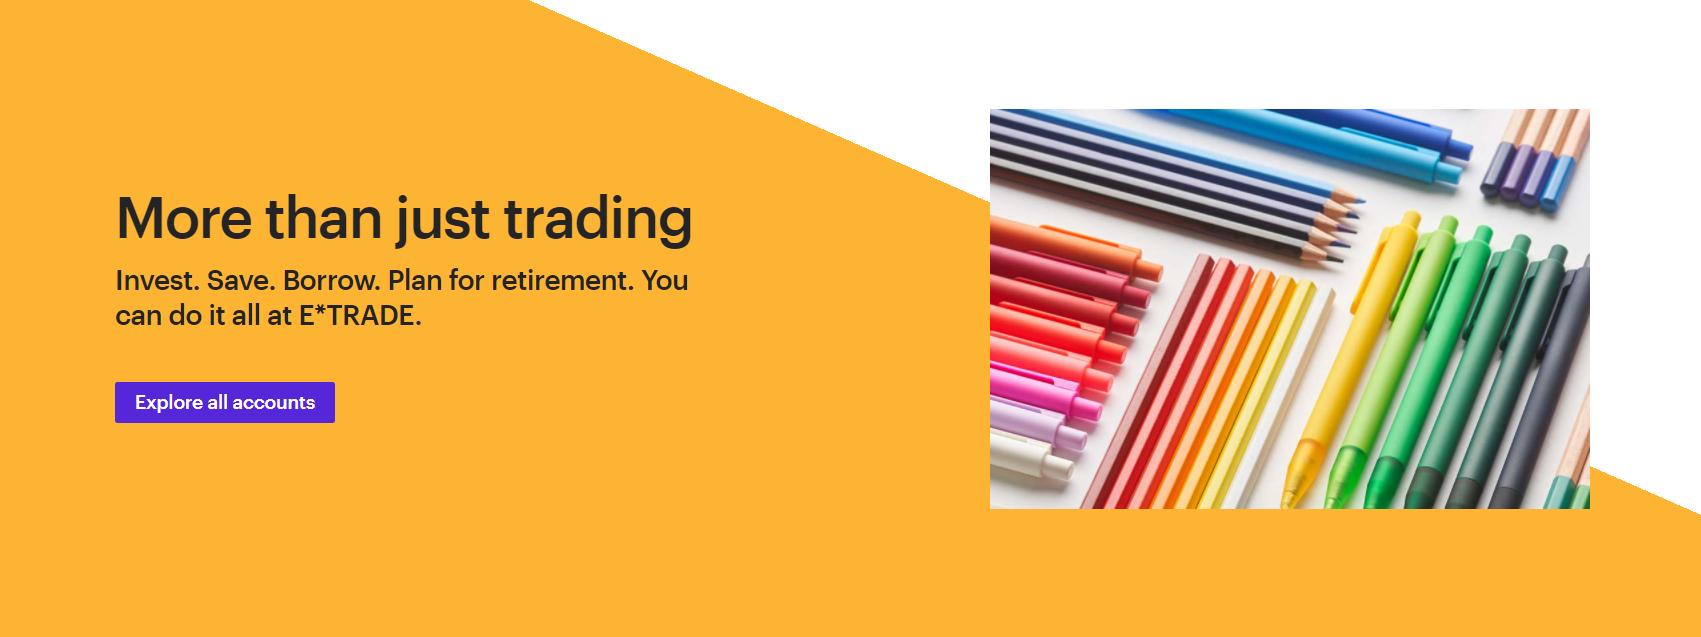 e*trade обзор деятельности компании